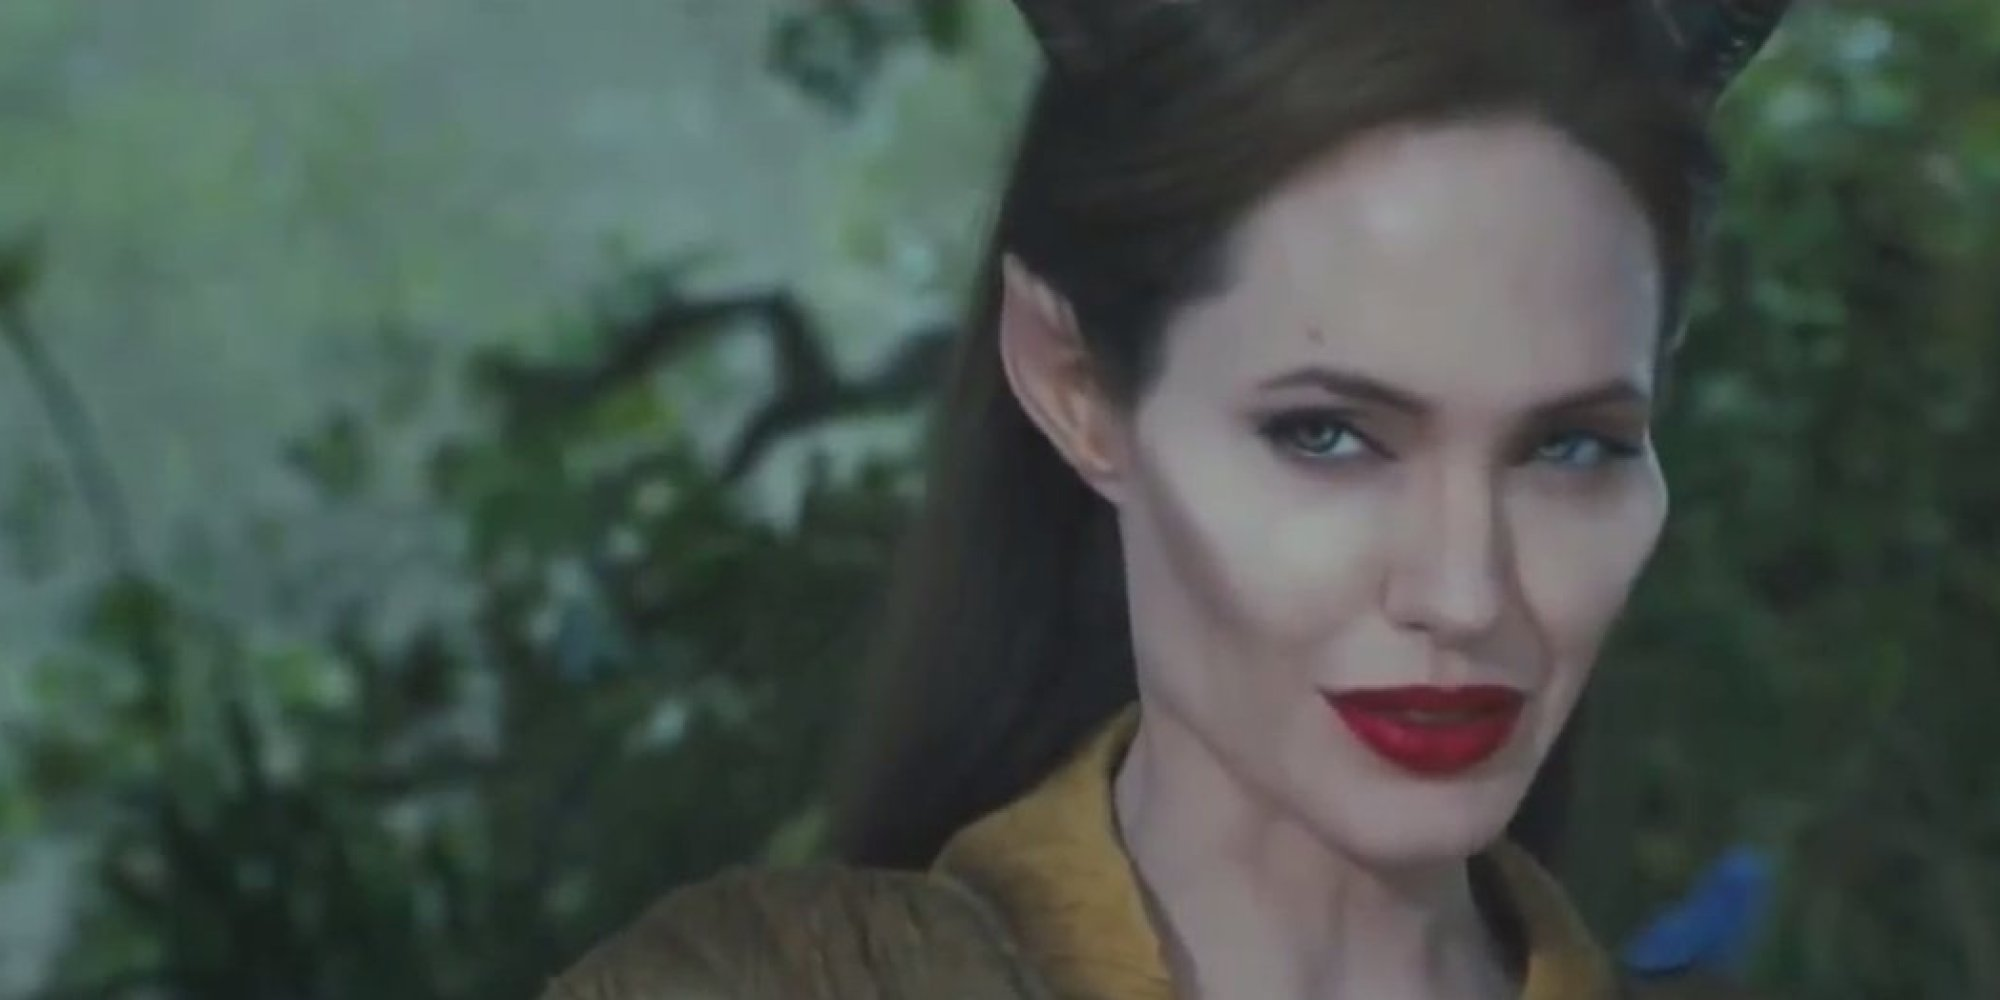 maleficent trailer makes angelina jolies cheekbones